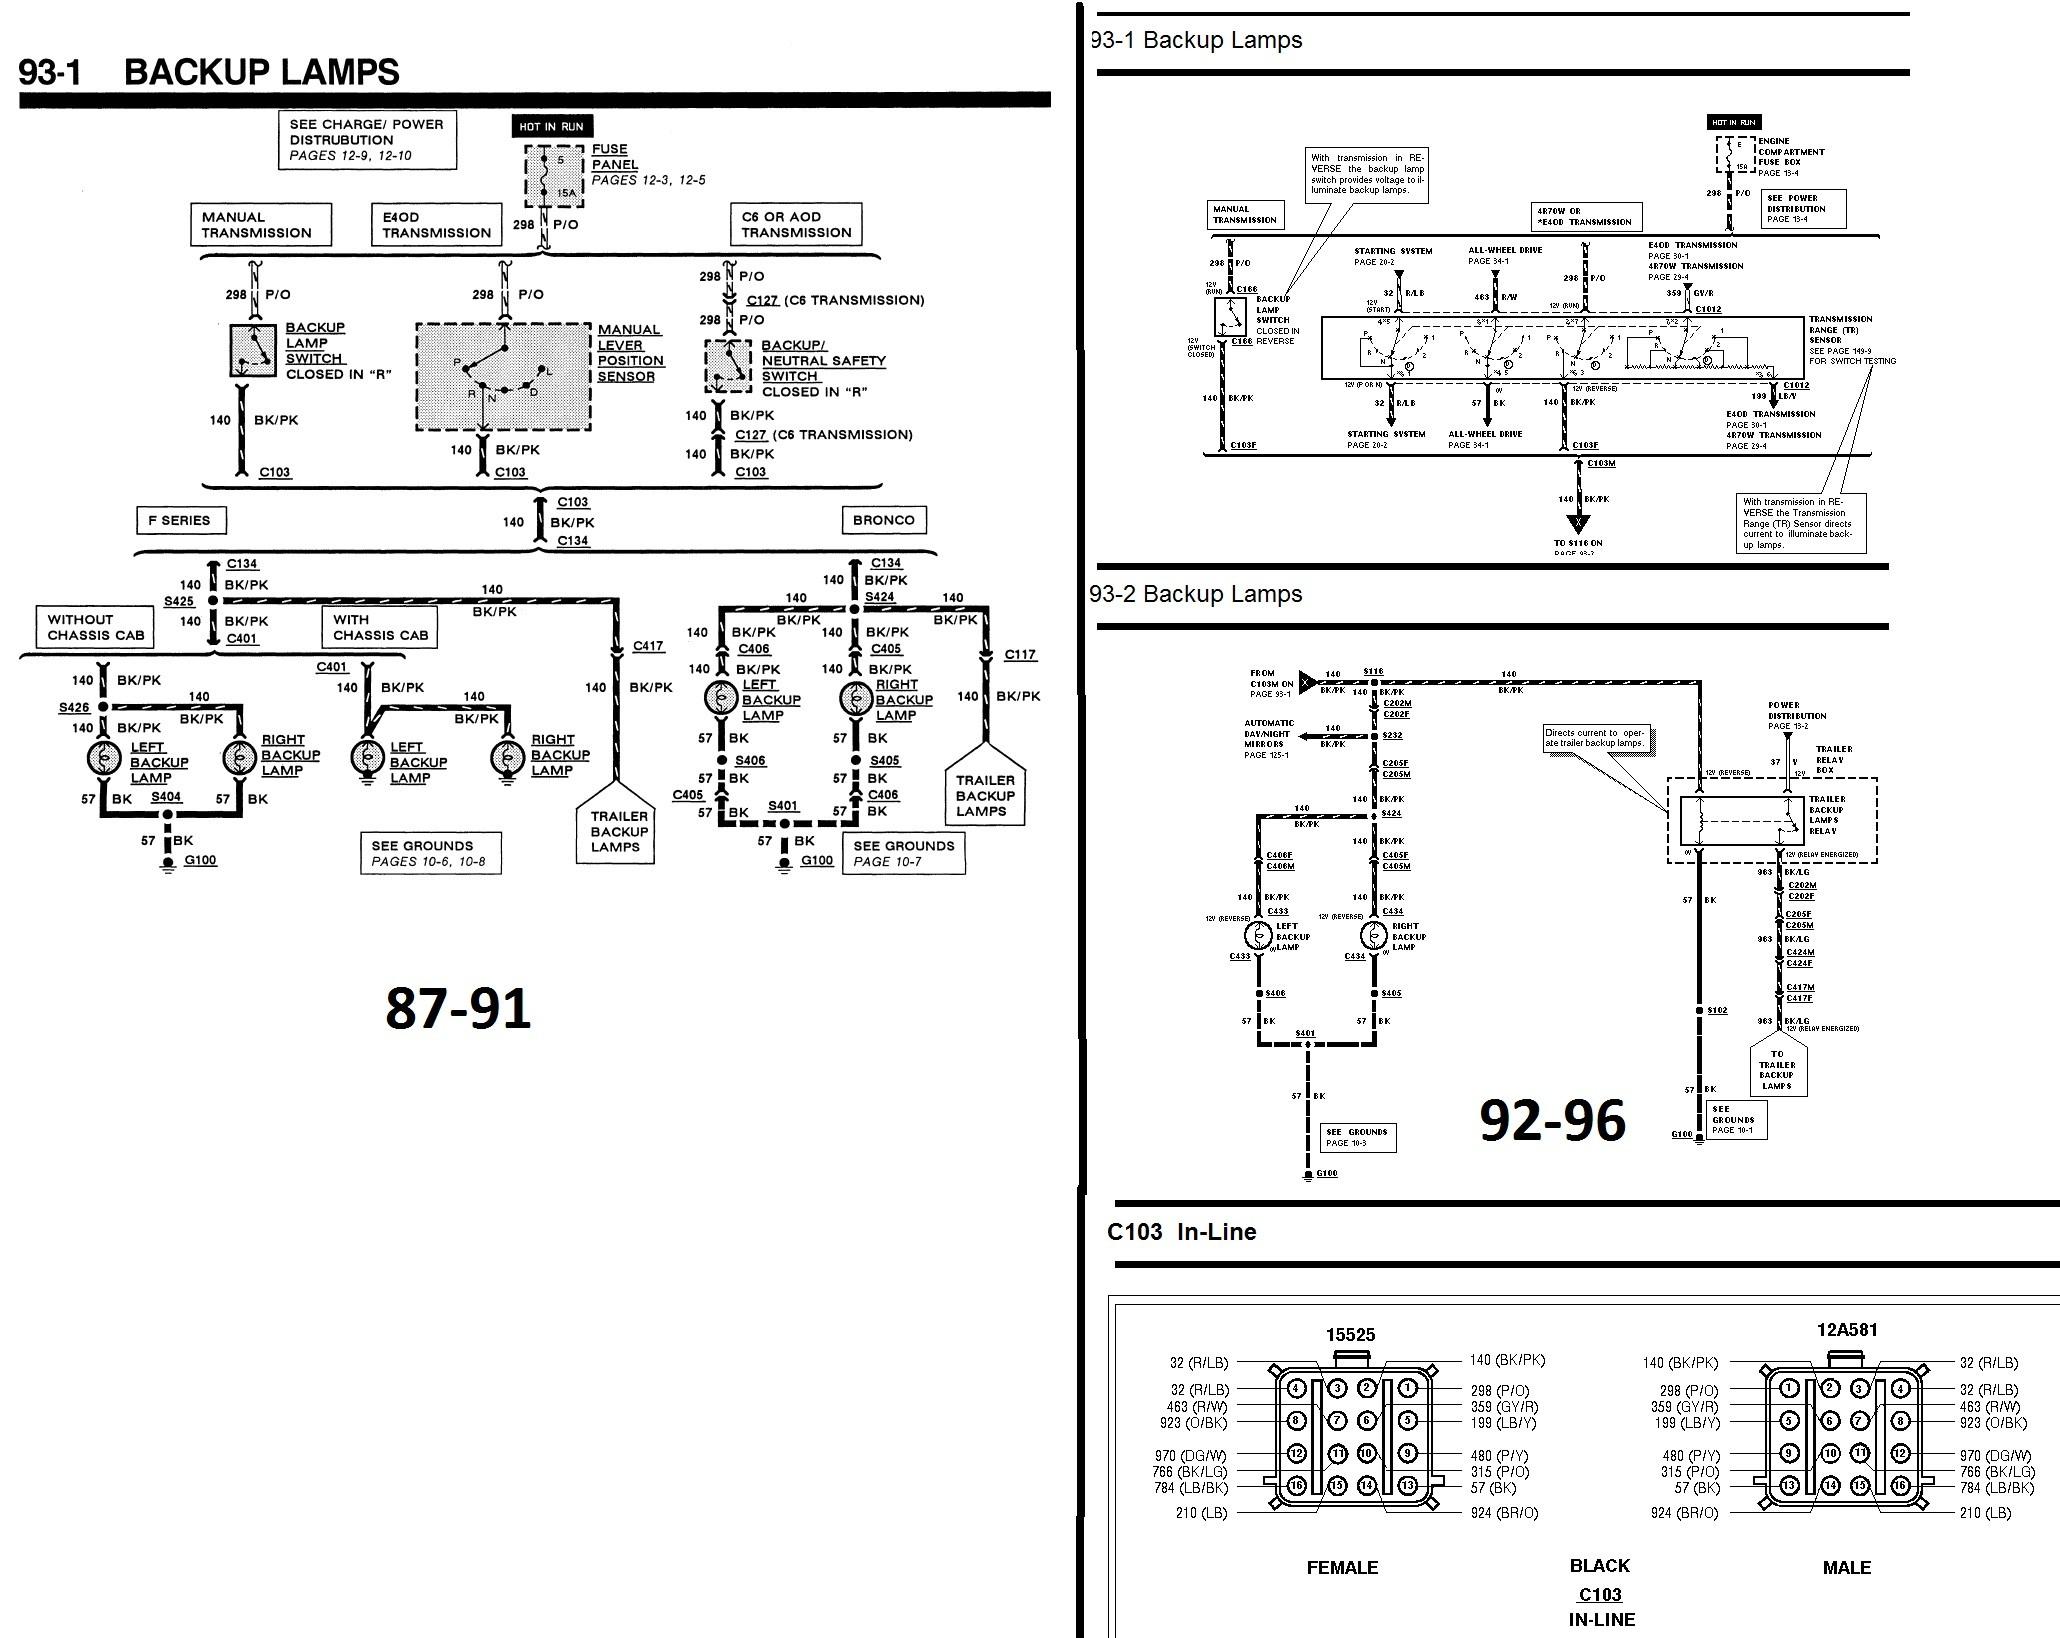 Gentex Mirror Wiring Diagram A2fd5b Gentex Mirror Wiring Diagram General Discussion Of Gentex Mirror Wiring Diagram